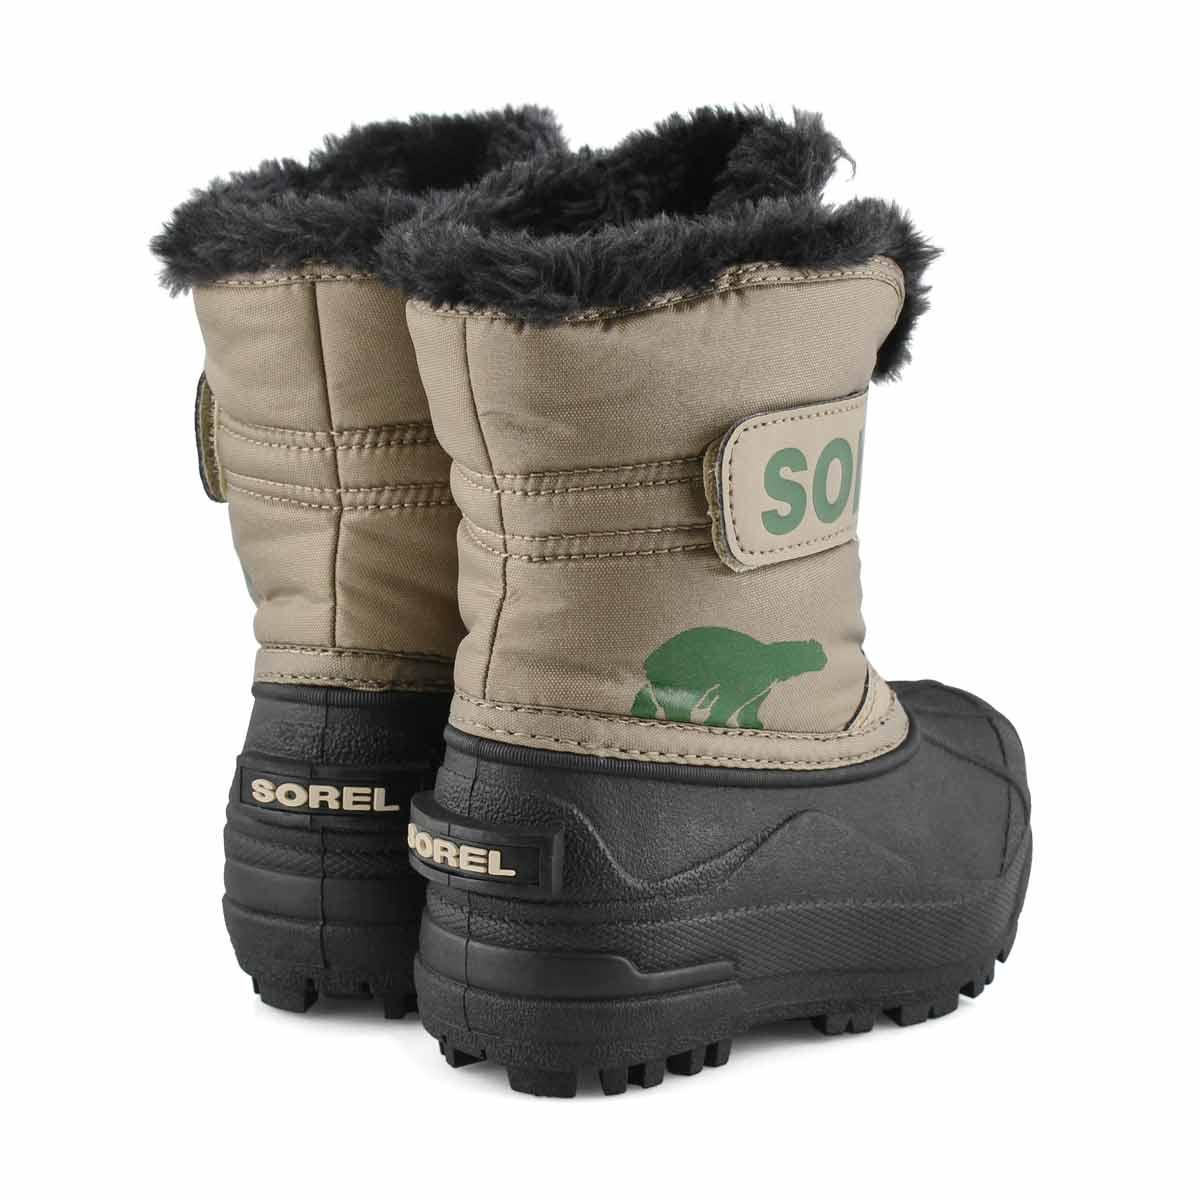 Infs Snow Commander khaki boot